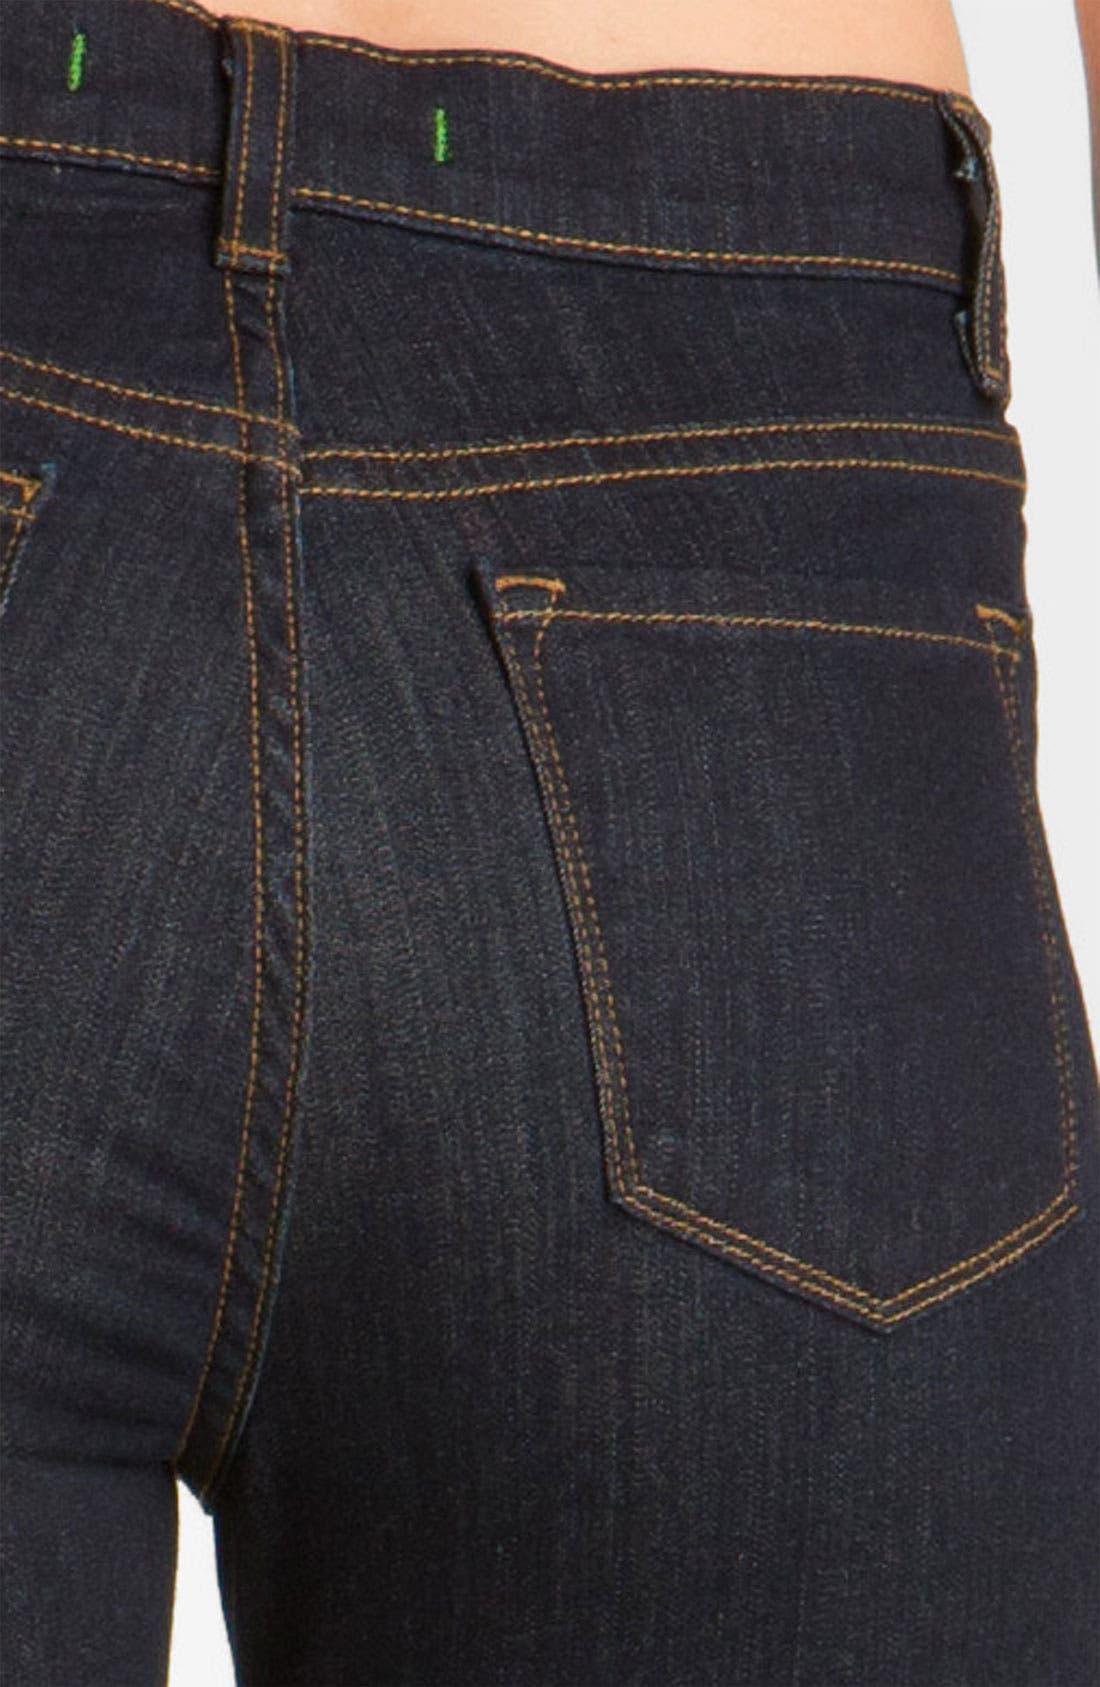 Alternate Image 3  - J Brand 'Maria' Crop Skinny Stretch Jeans (Starless)